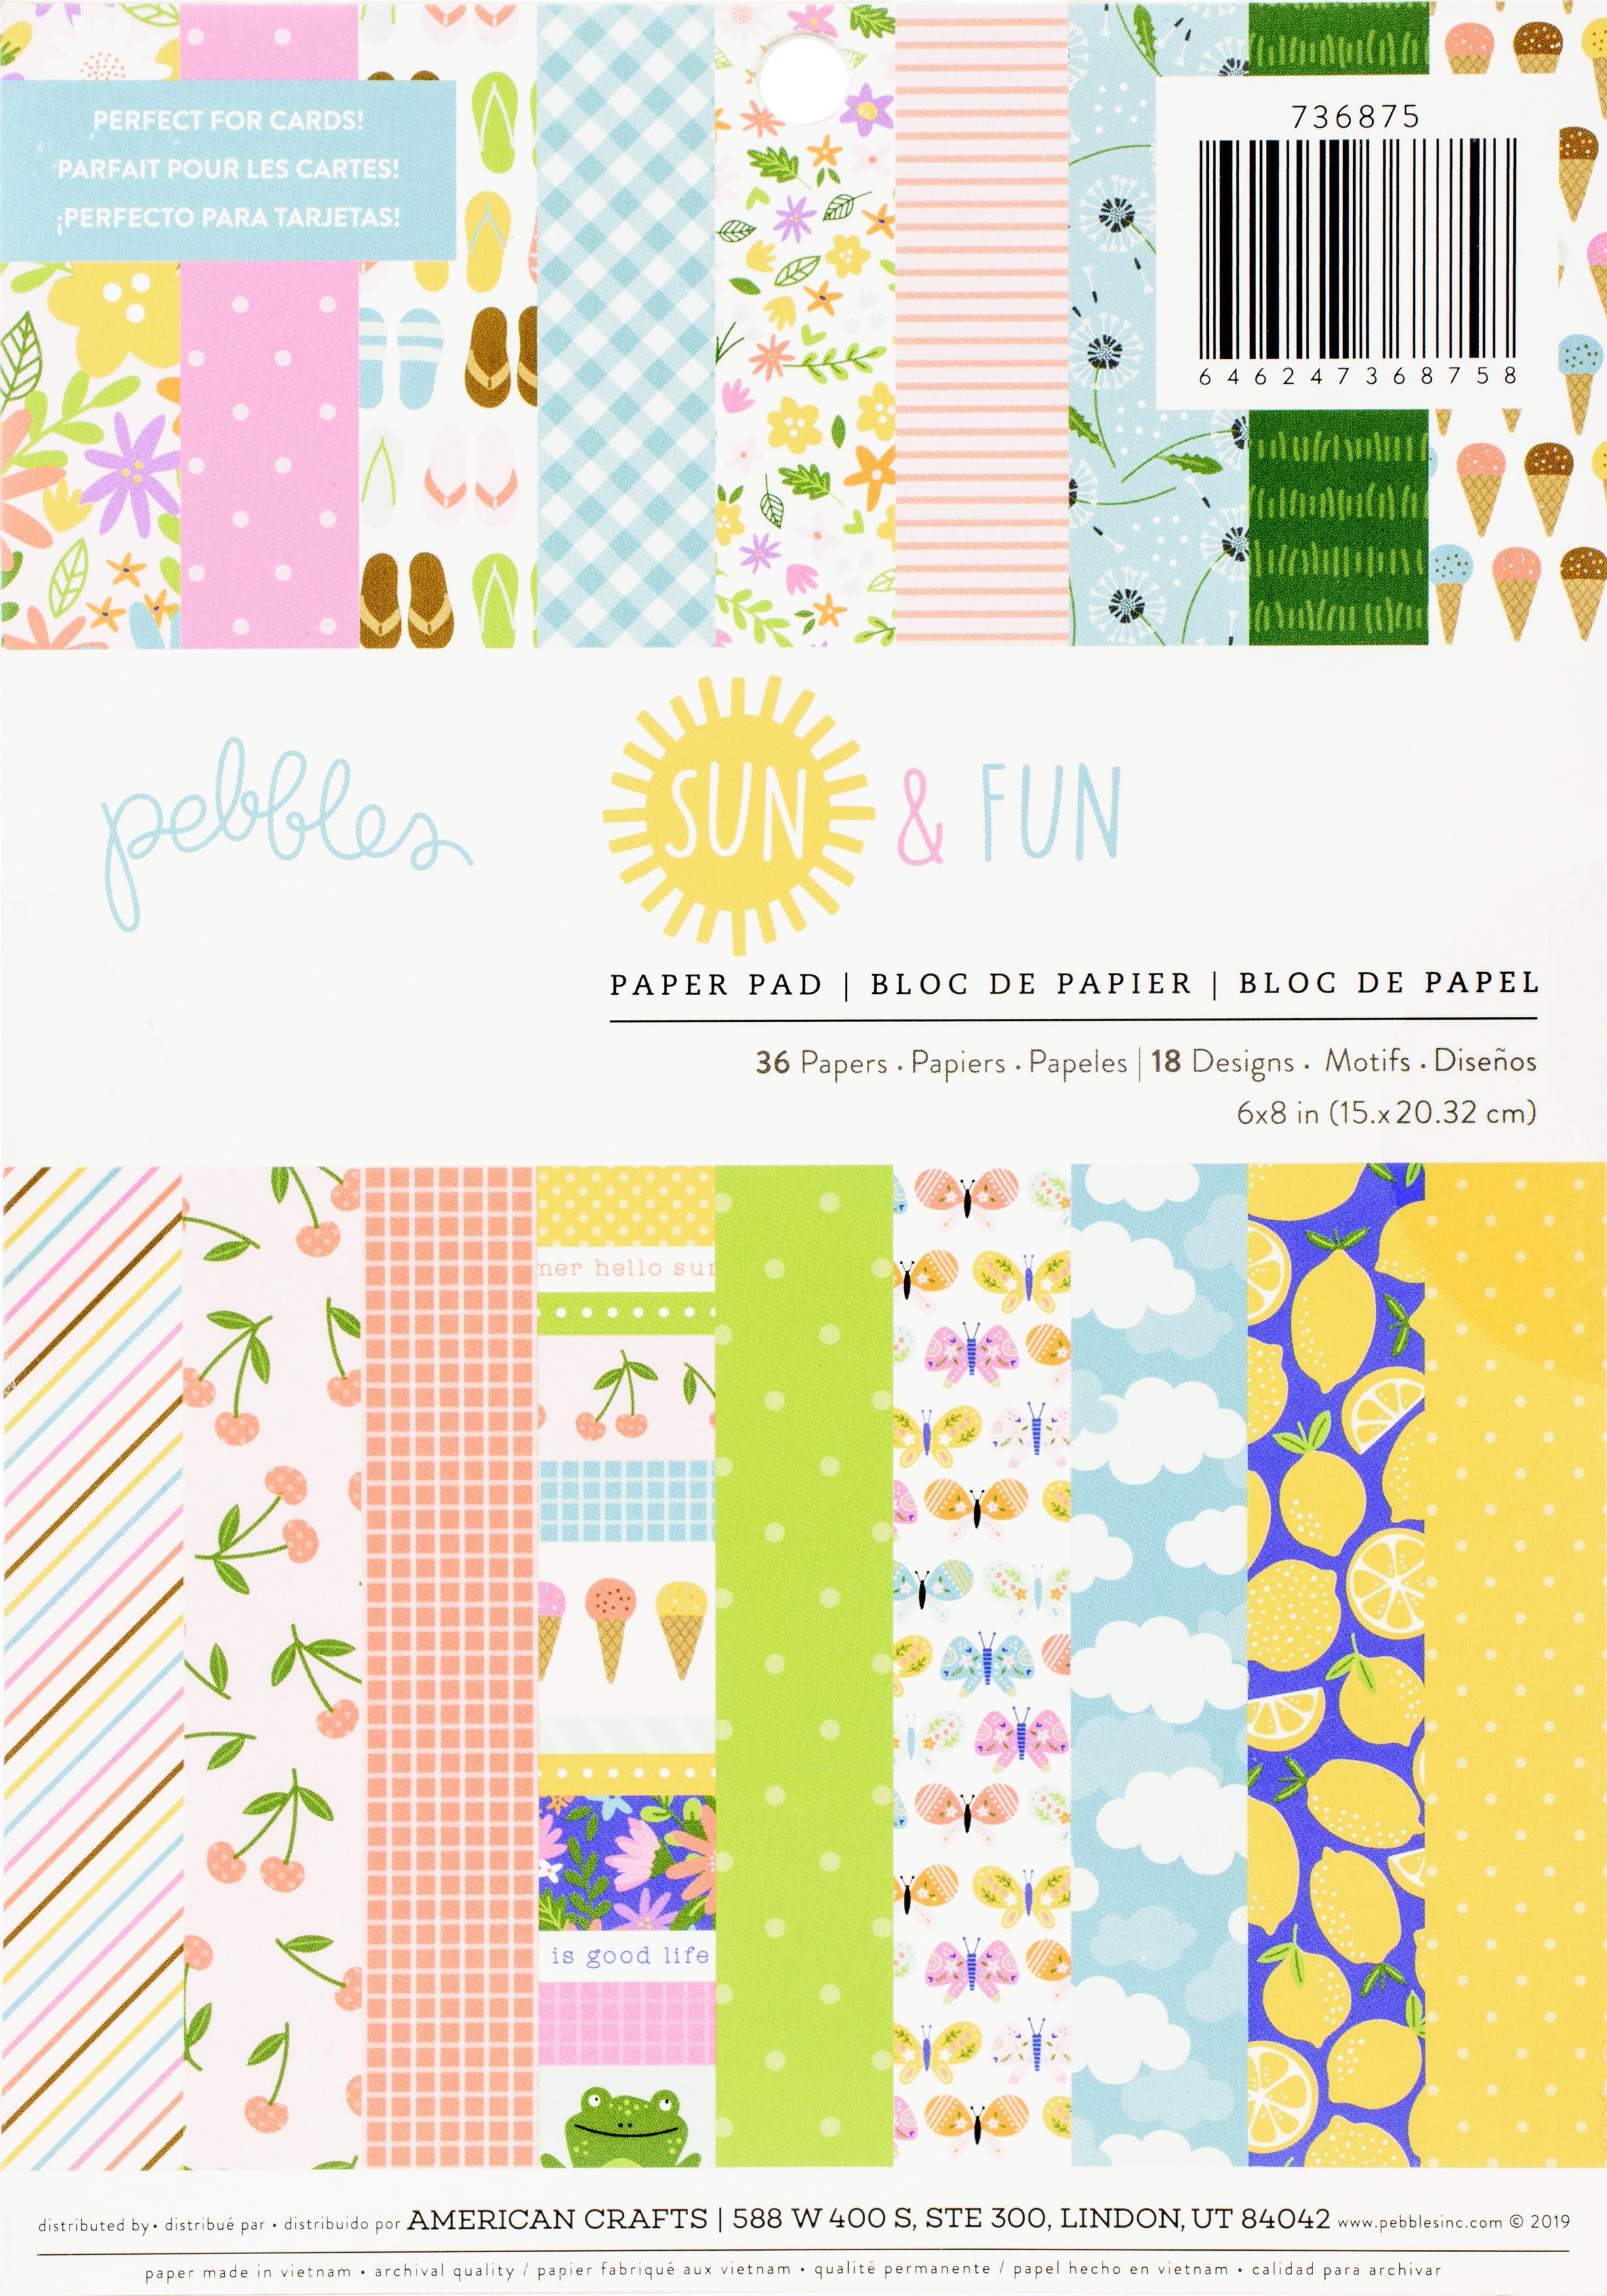 Pebbles Fun & Sun 6x8 paper pad